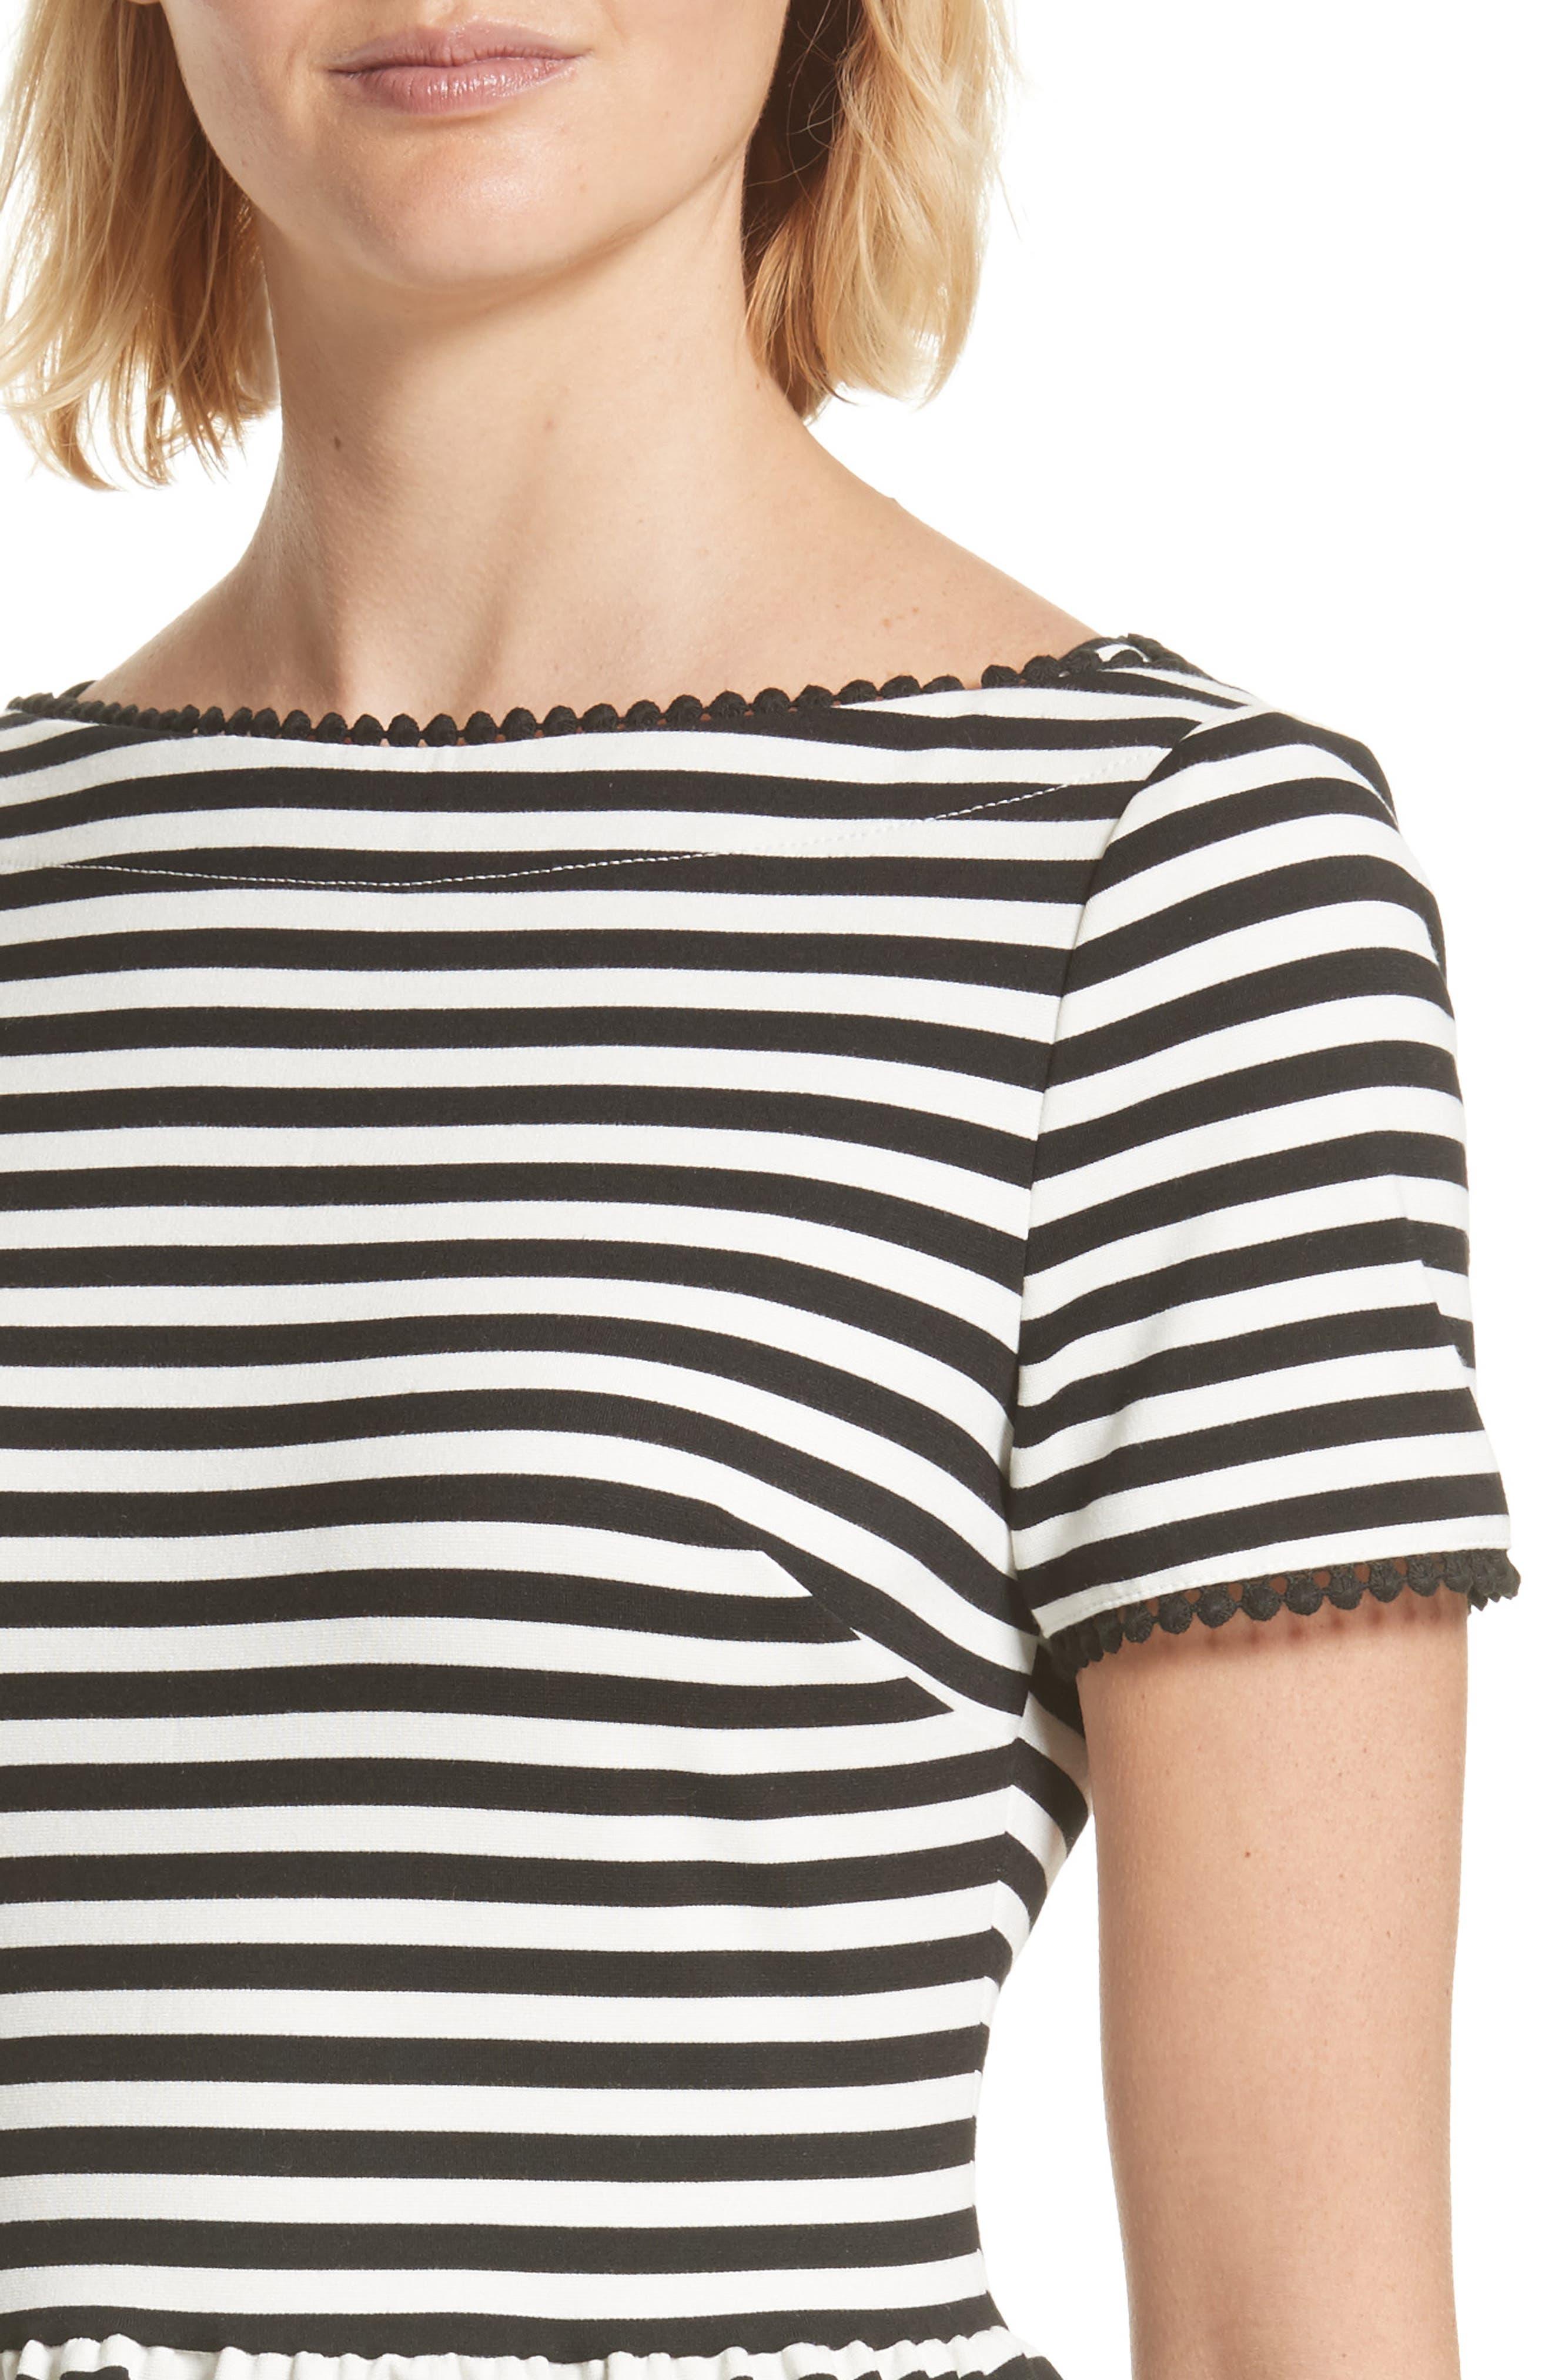 KATE SPADE NEW YORK,                             stripe ponte dress,                             Alternate thumbnail 4, color,                             900